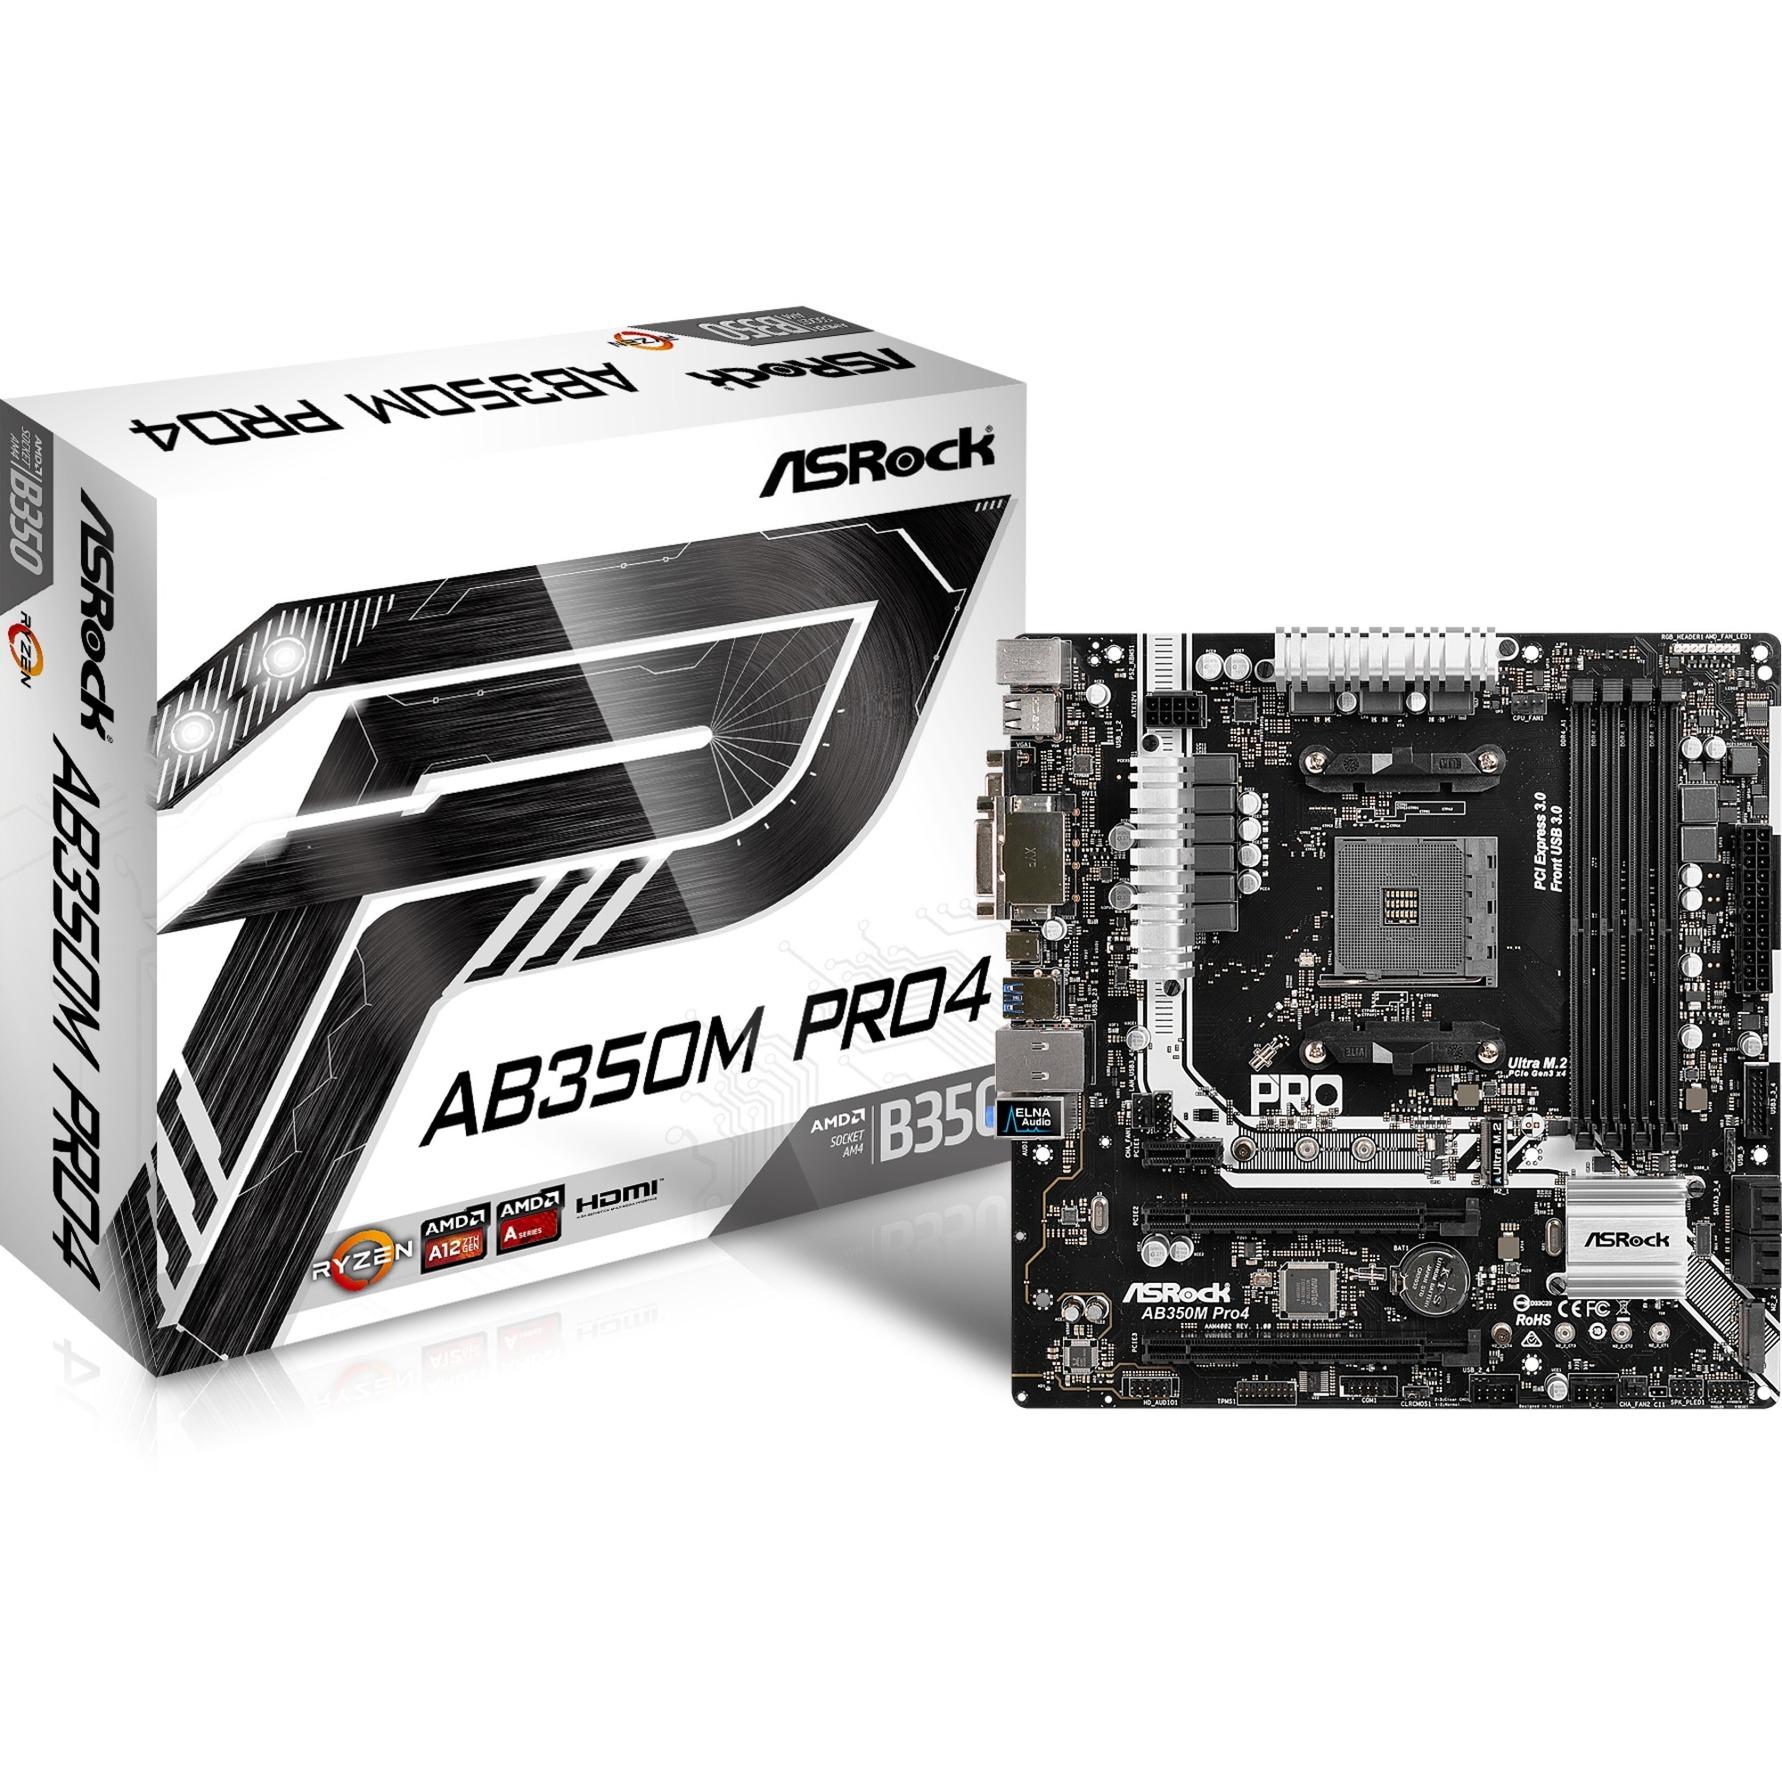 AB350M Pro4 AMD B350 Socket AM4 Micro ATX placa base